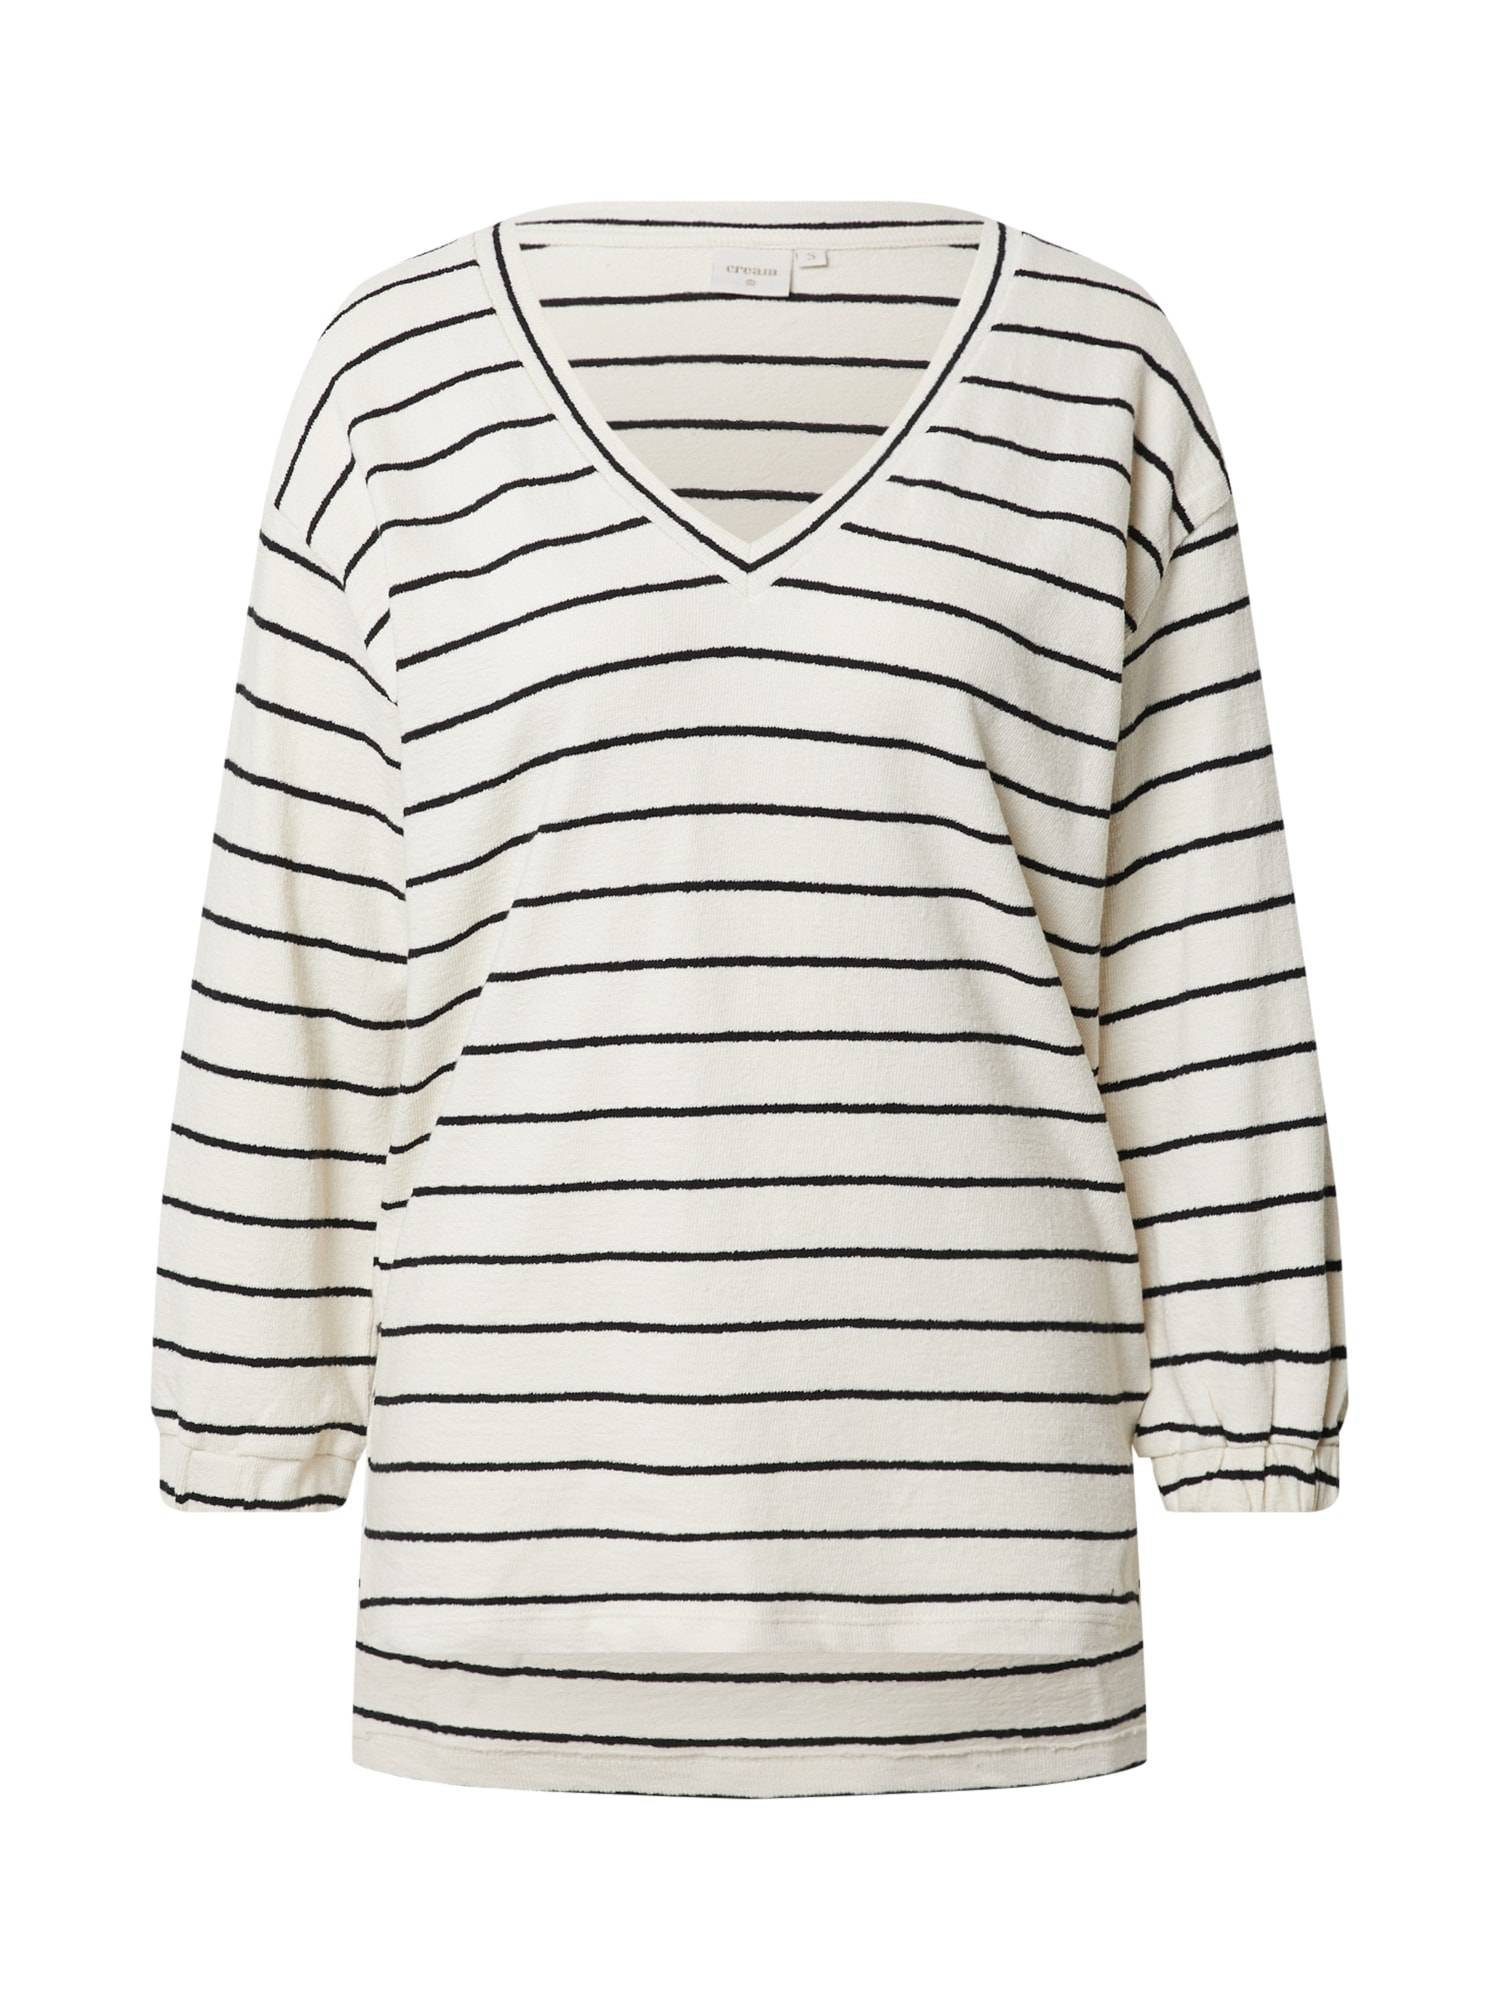 Cream T-shirt 'Krystala'  - Blanc - Taille: XS - female